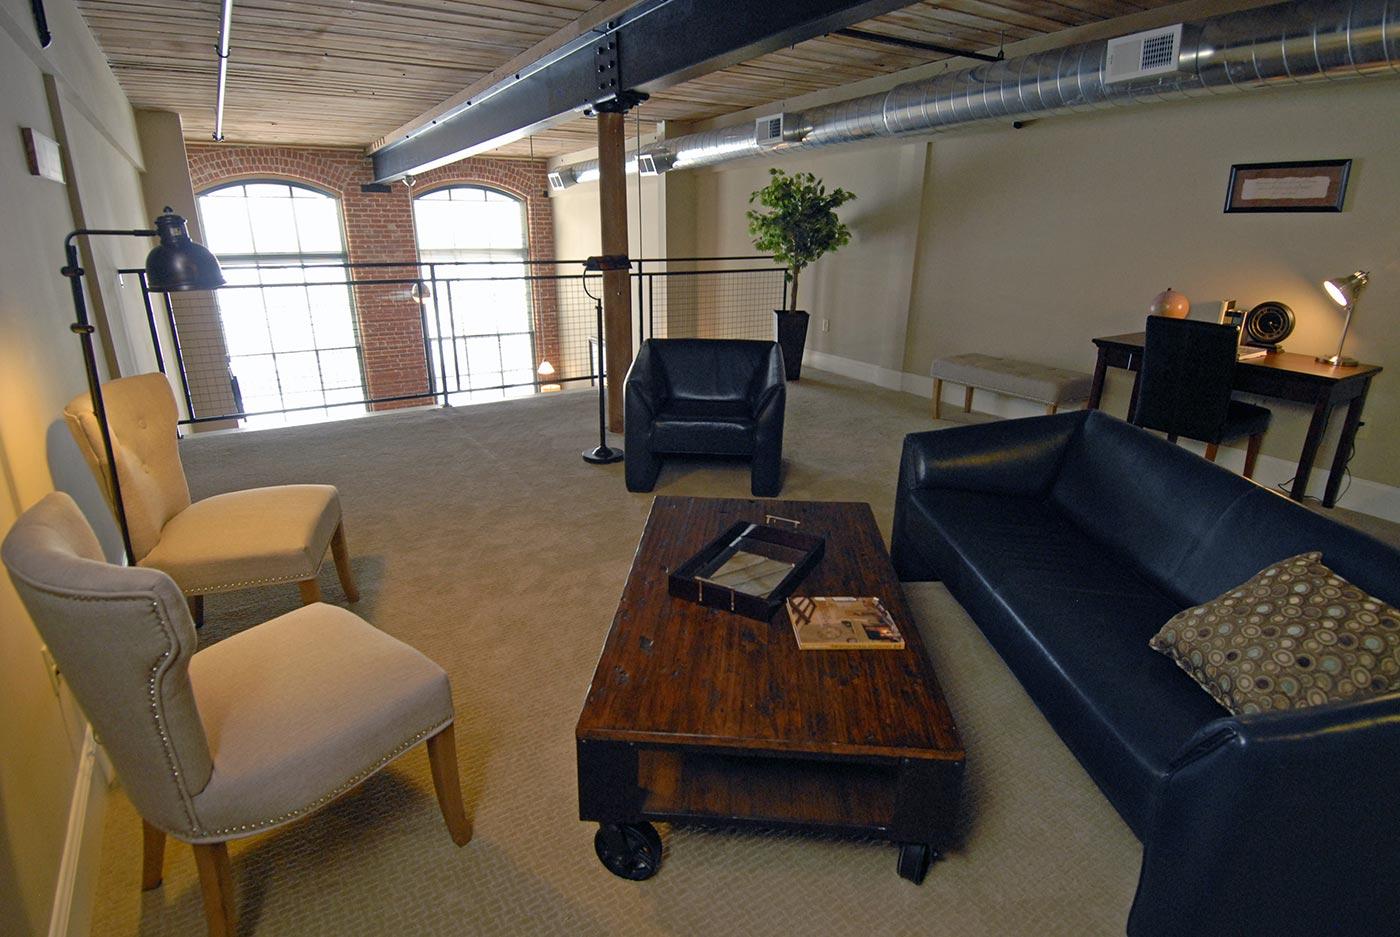 Commercial Insurance Brokers >> Harris Mill Lofts - Coventry, RI | Brady Sullivan Properties